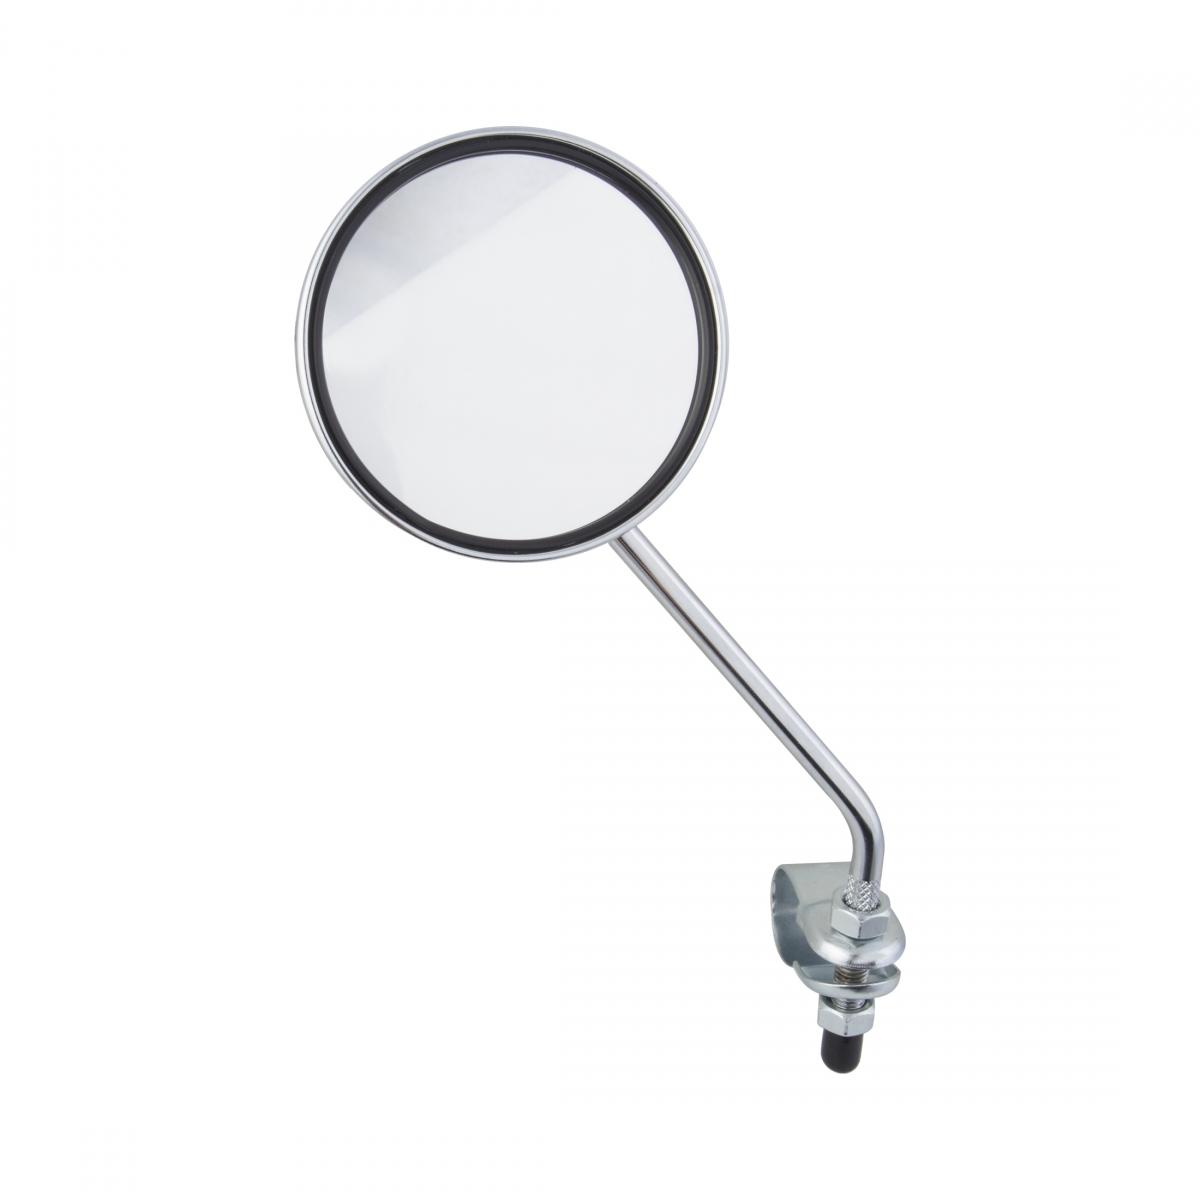 Sunlite Deluxe MTB Mirror Mirror Sunlt Pro Mtb//road Strap-on